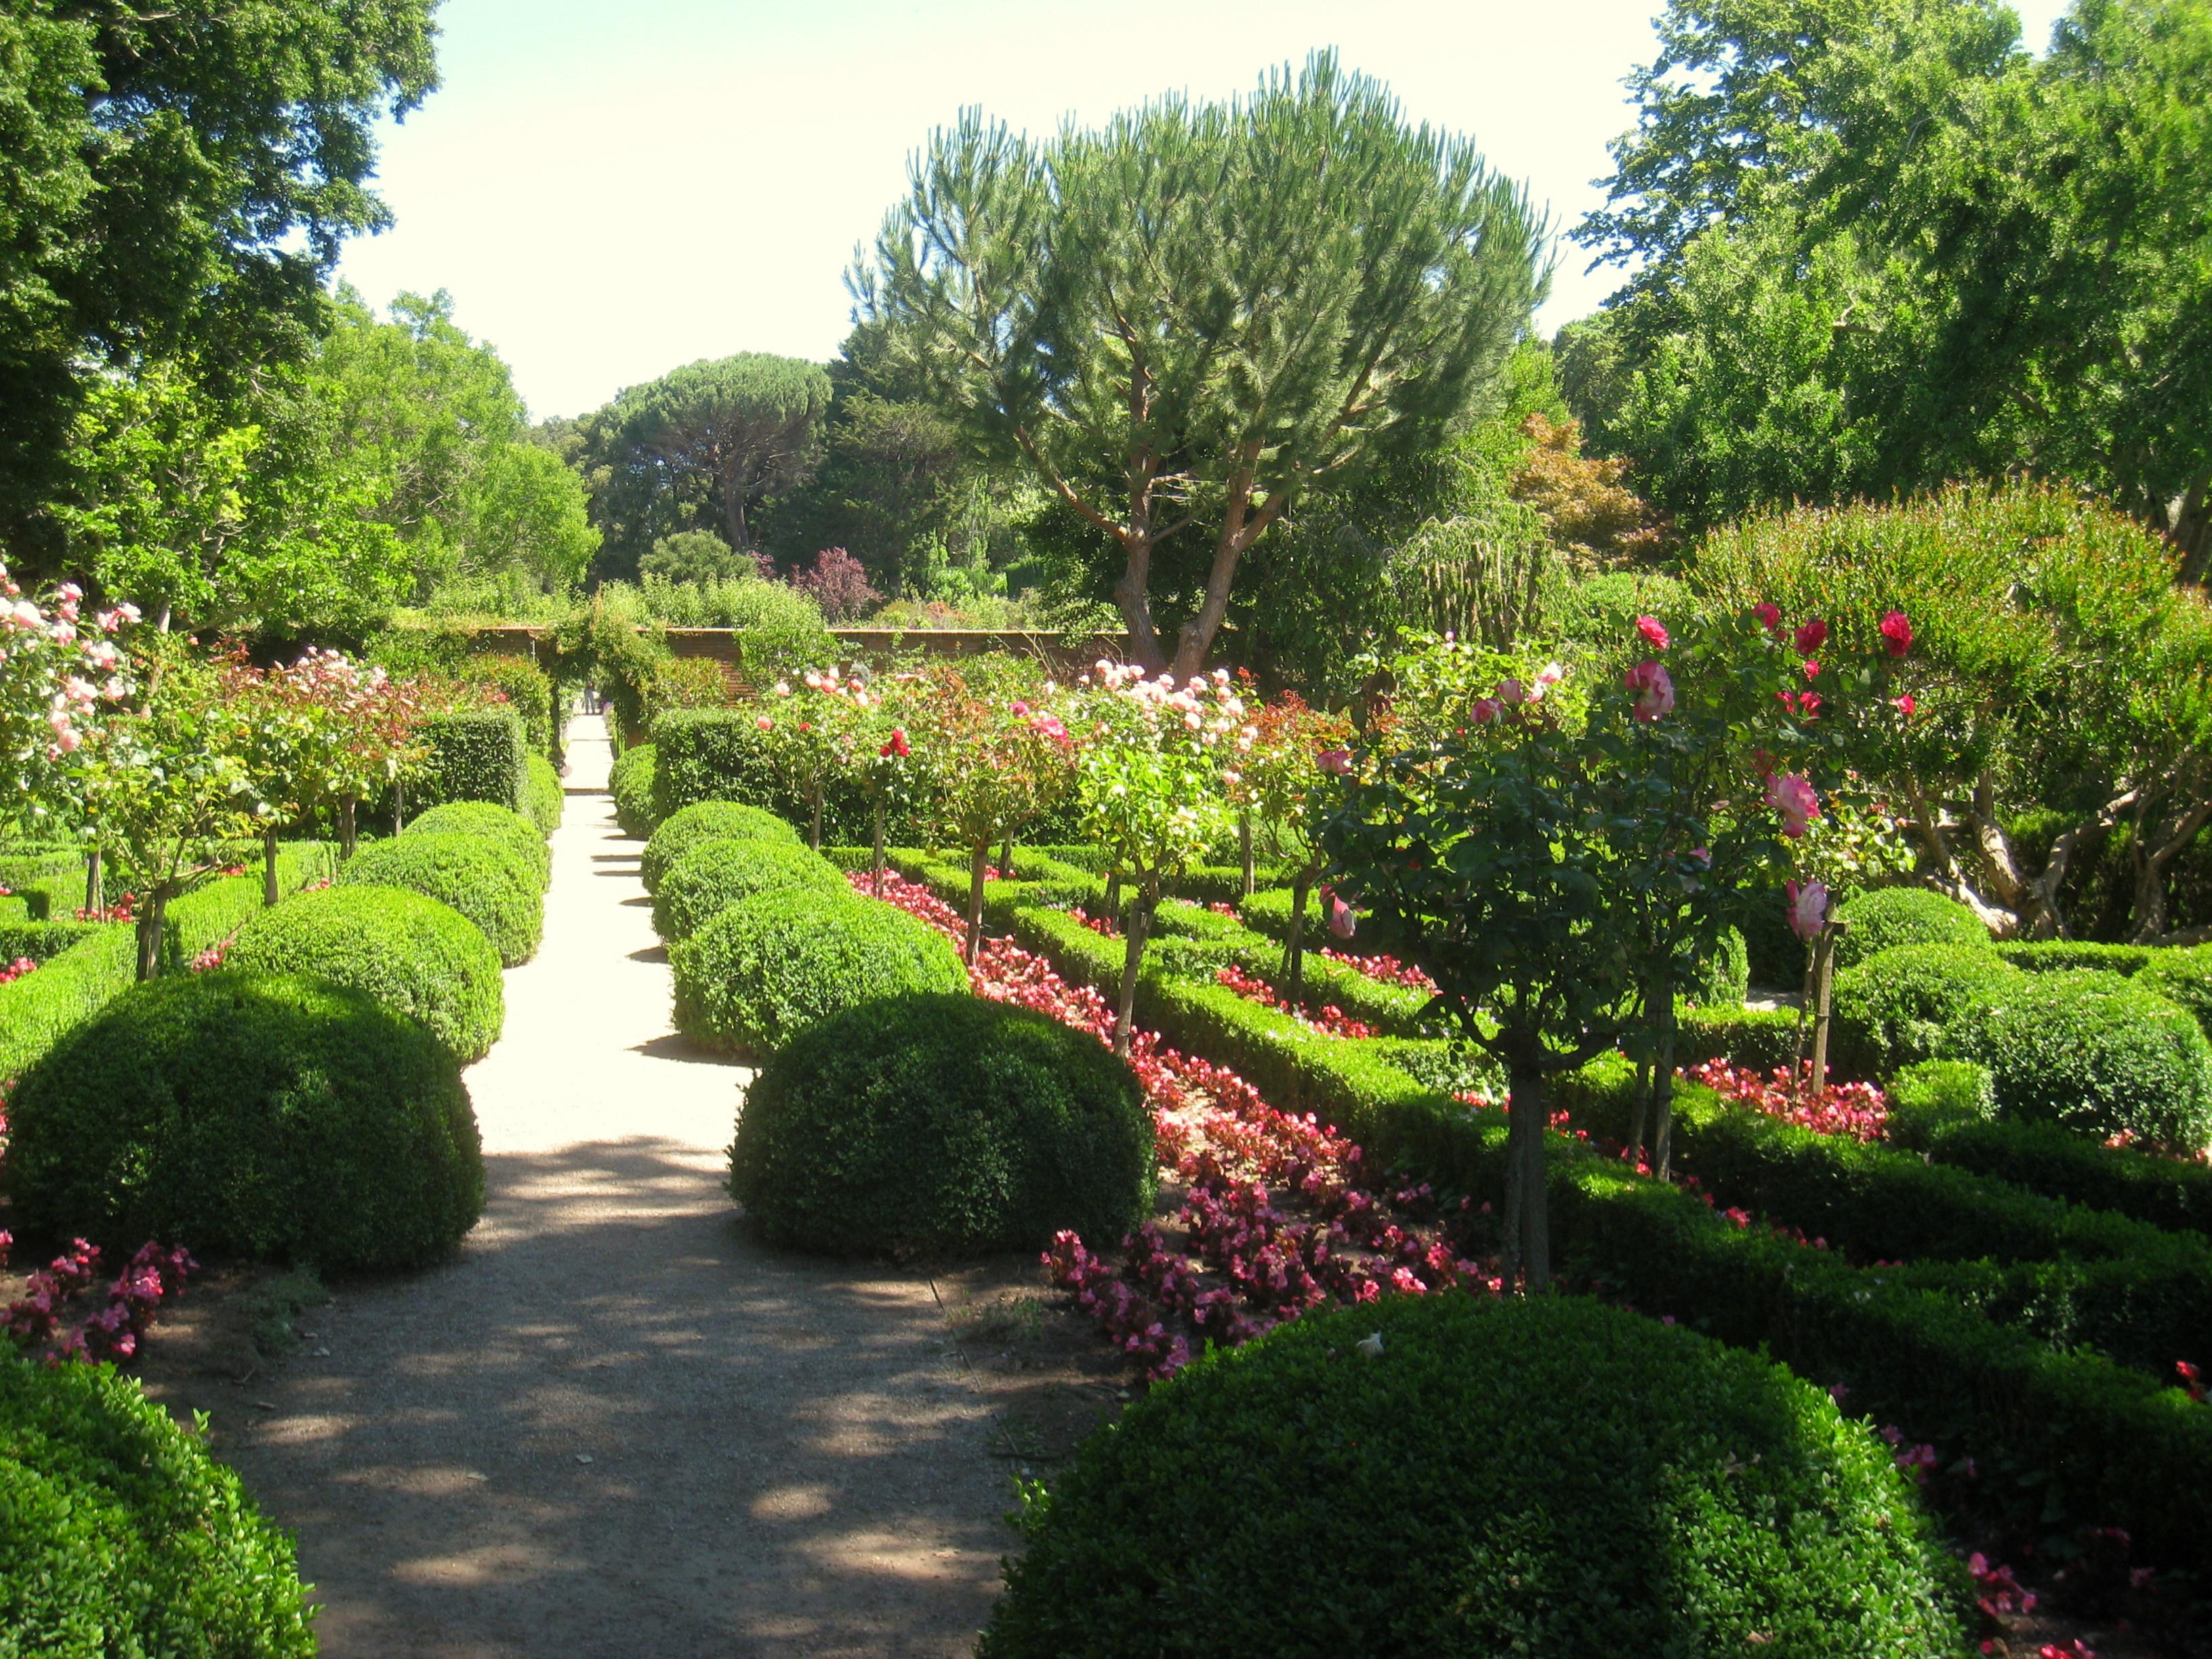 File:Filoli gardens - IMG 9309.JPG - Wikimedia Commons